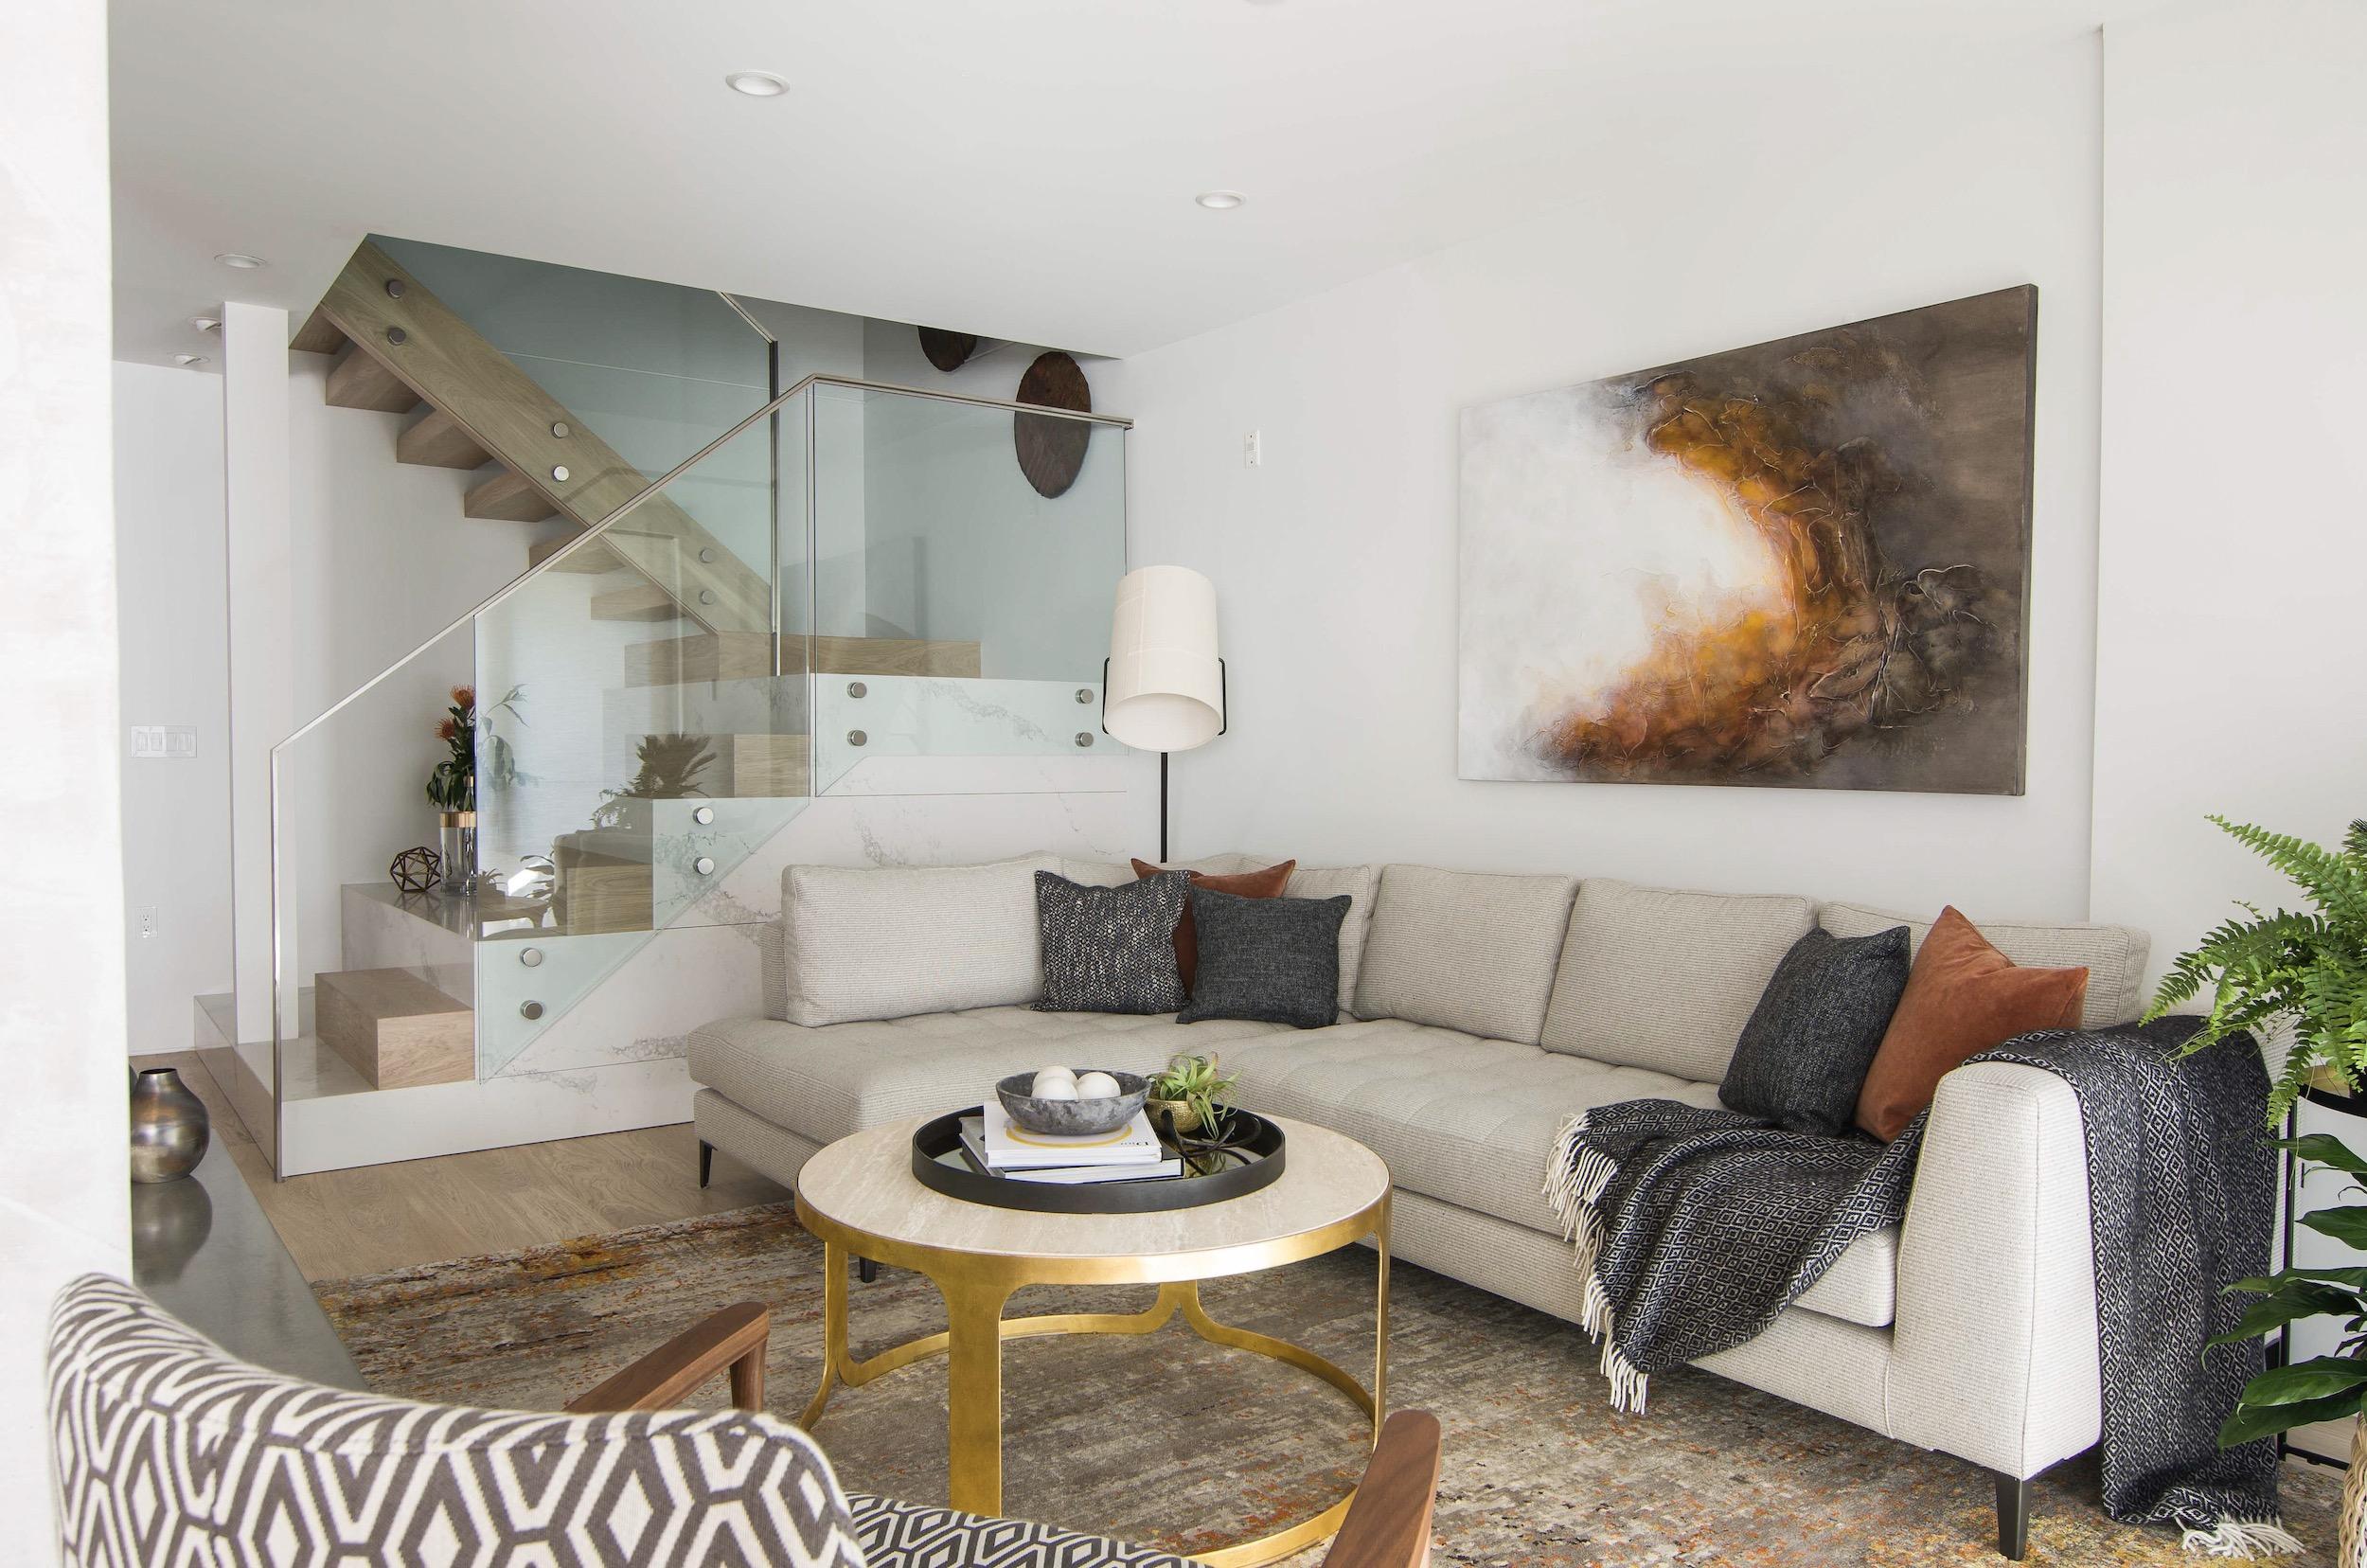 KRC_Spyglass_Living_Room_Staircase.JPG